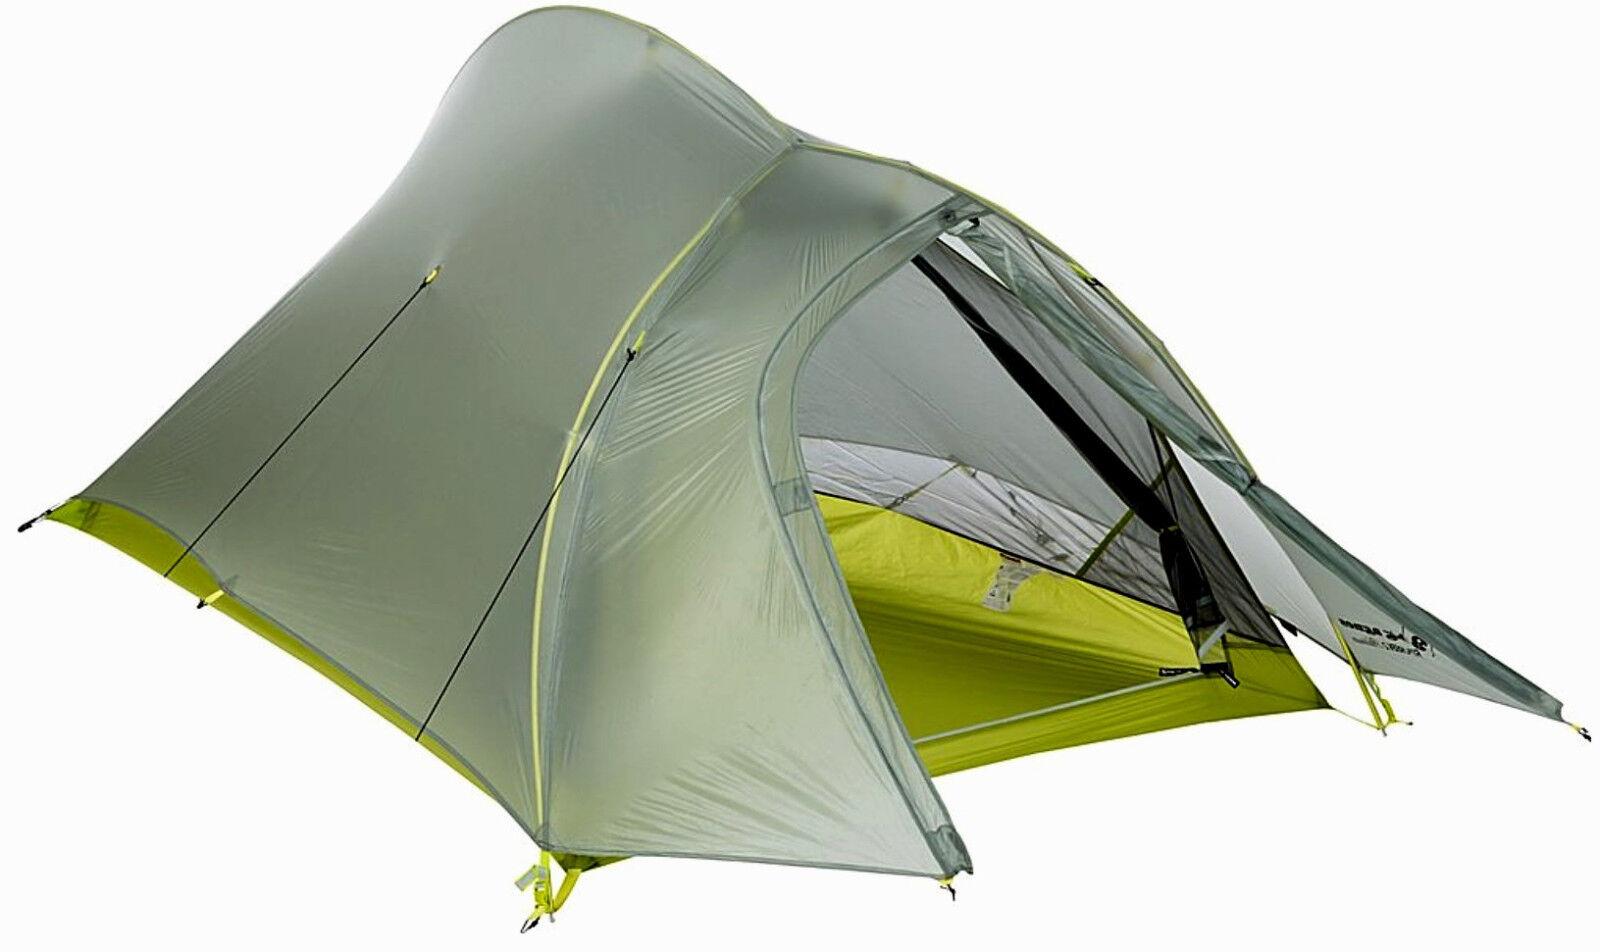 New Agnes Fly Creek PLATINUM UL 2 Person ultra-light Tent (2